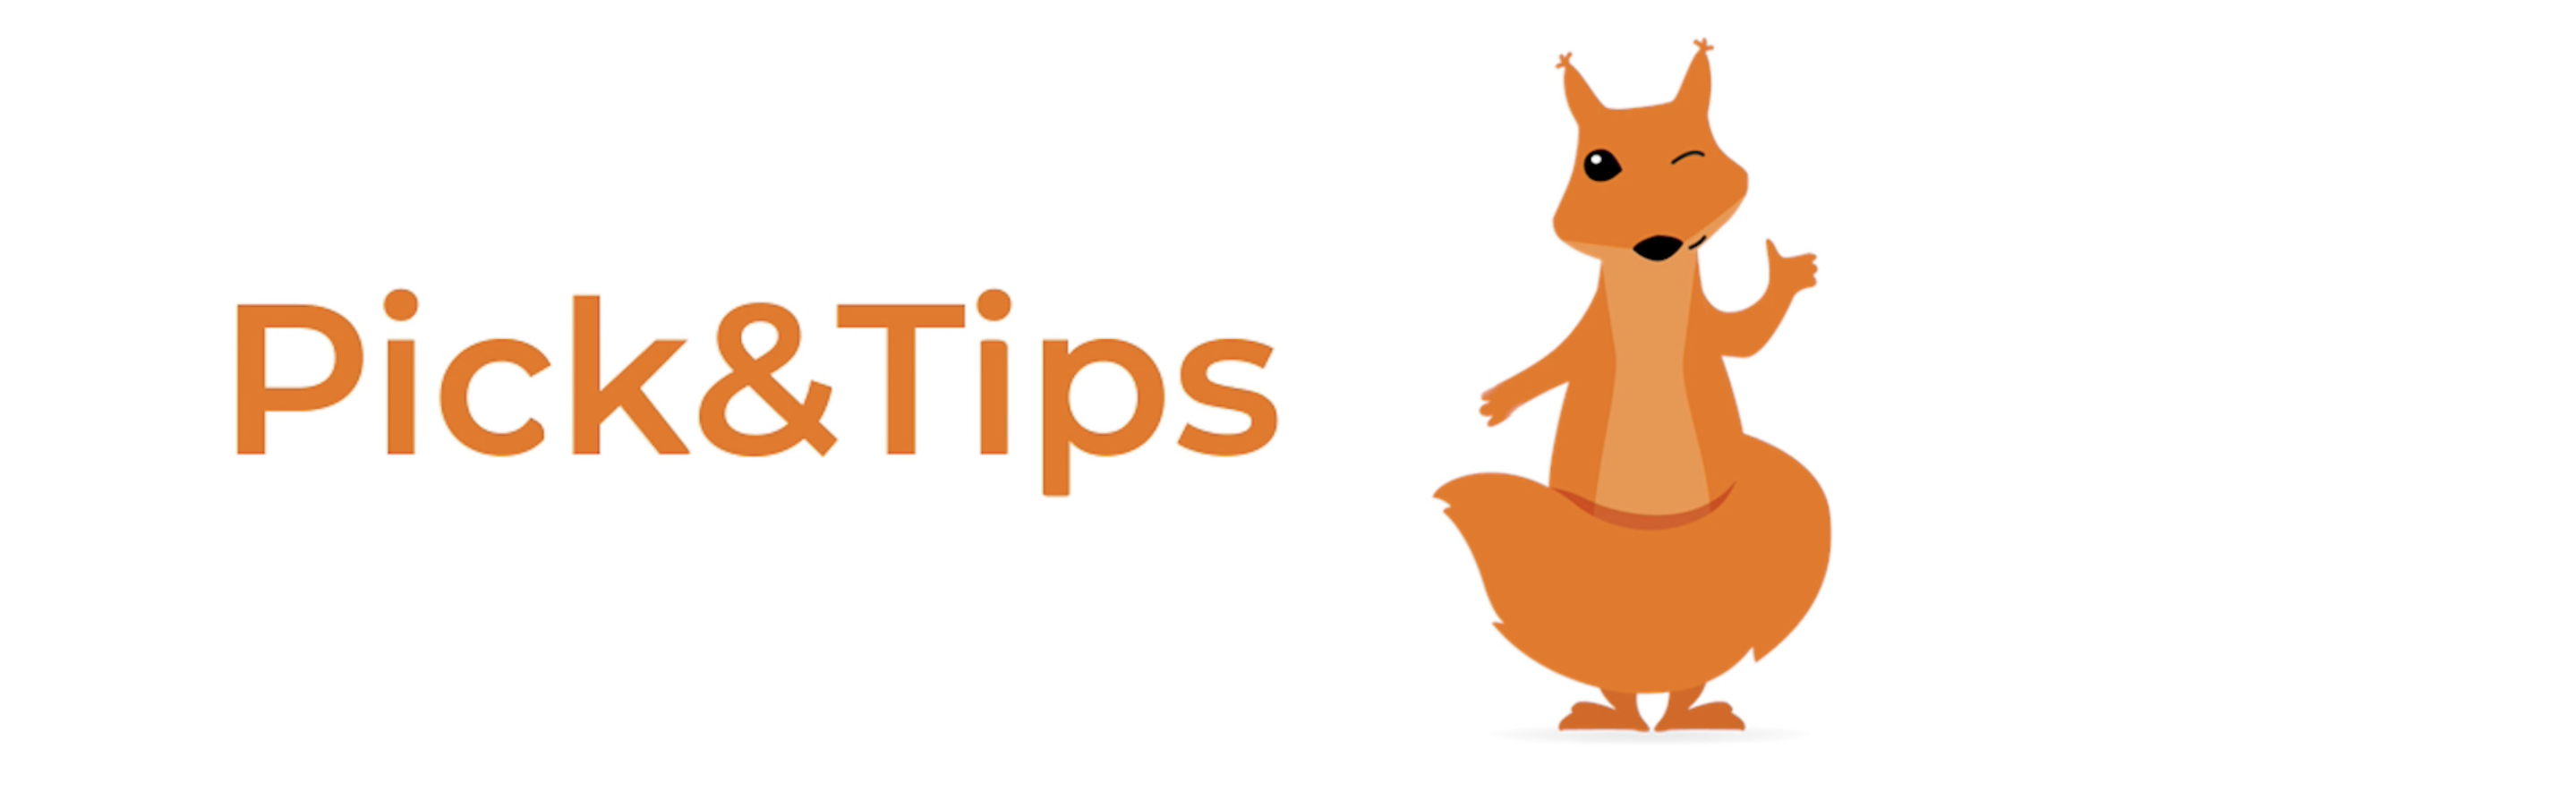 Pick&tips #1